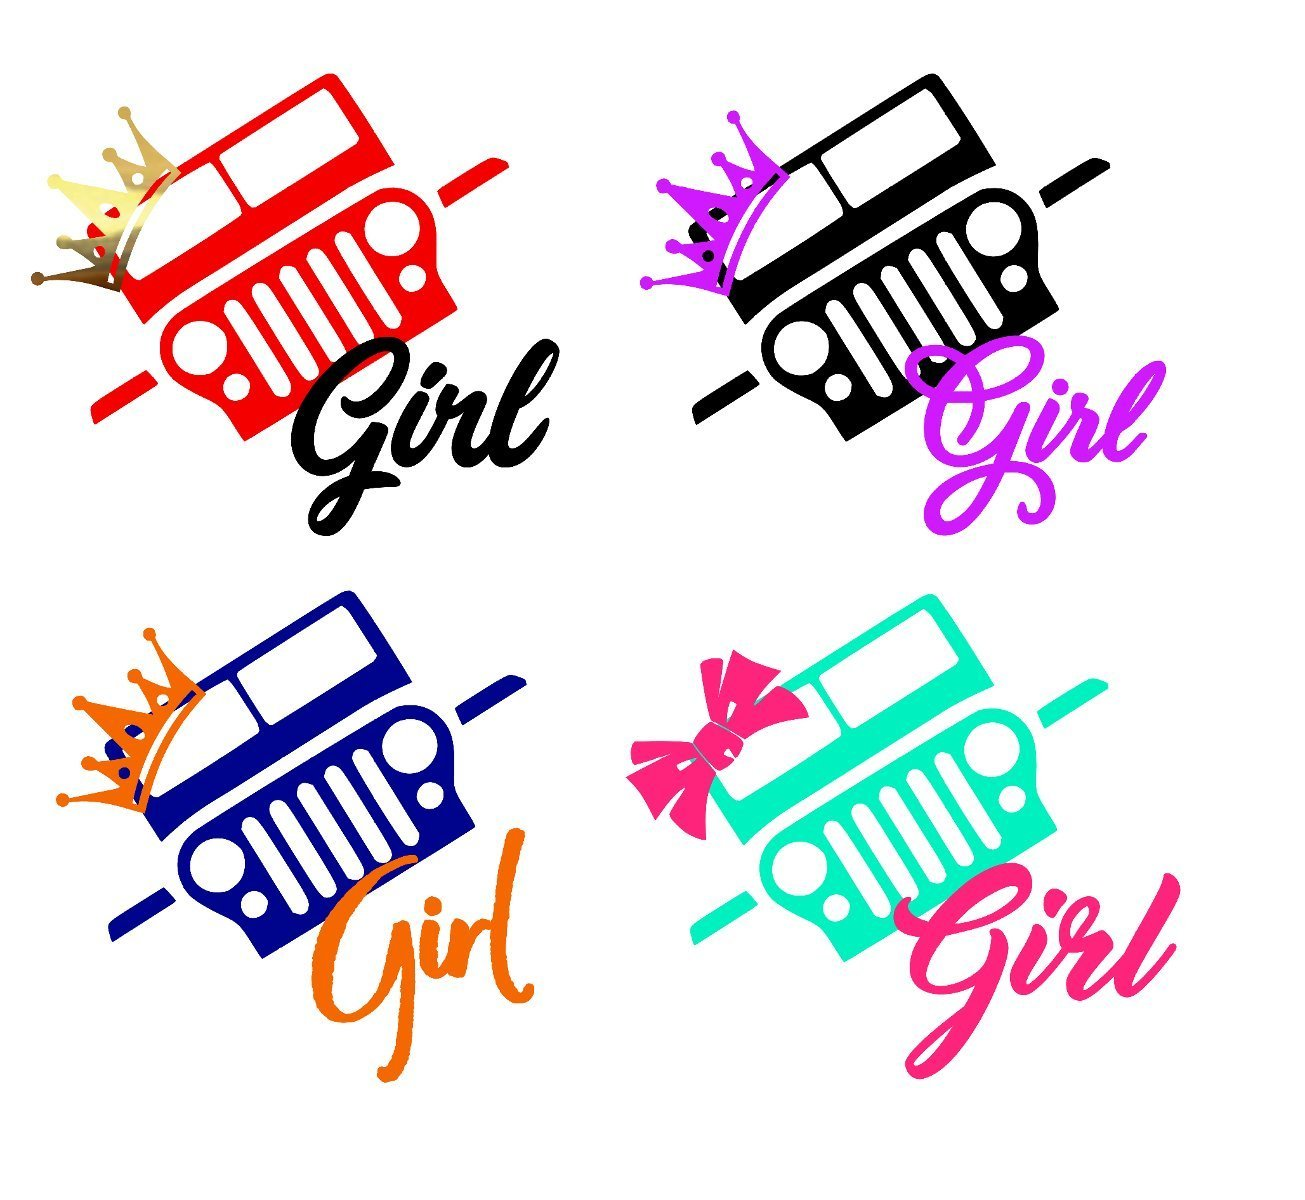 Amazon com custom jeep girl 4x4 decal sticker for laptop locker car yeti rtic ozark cooler tumbler or cup handmade